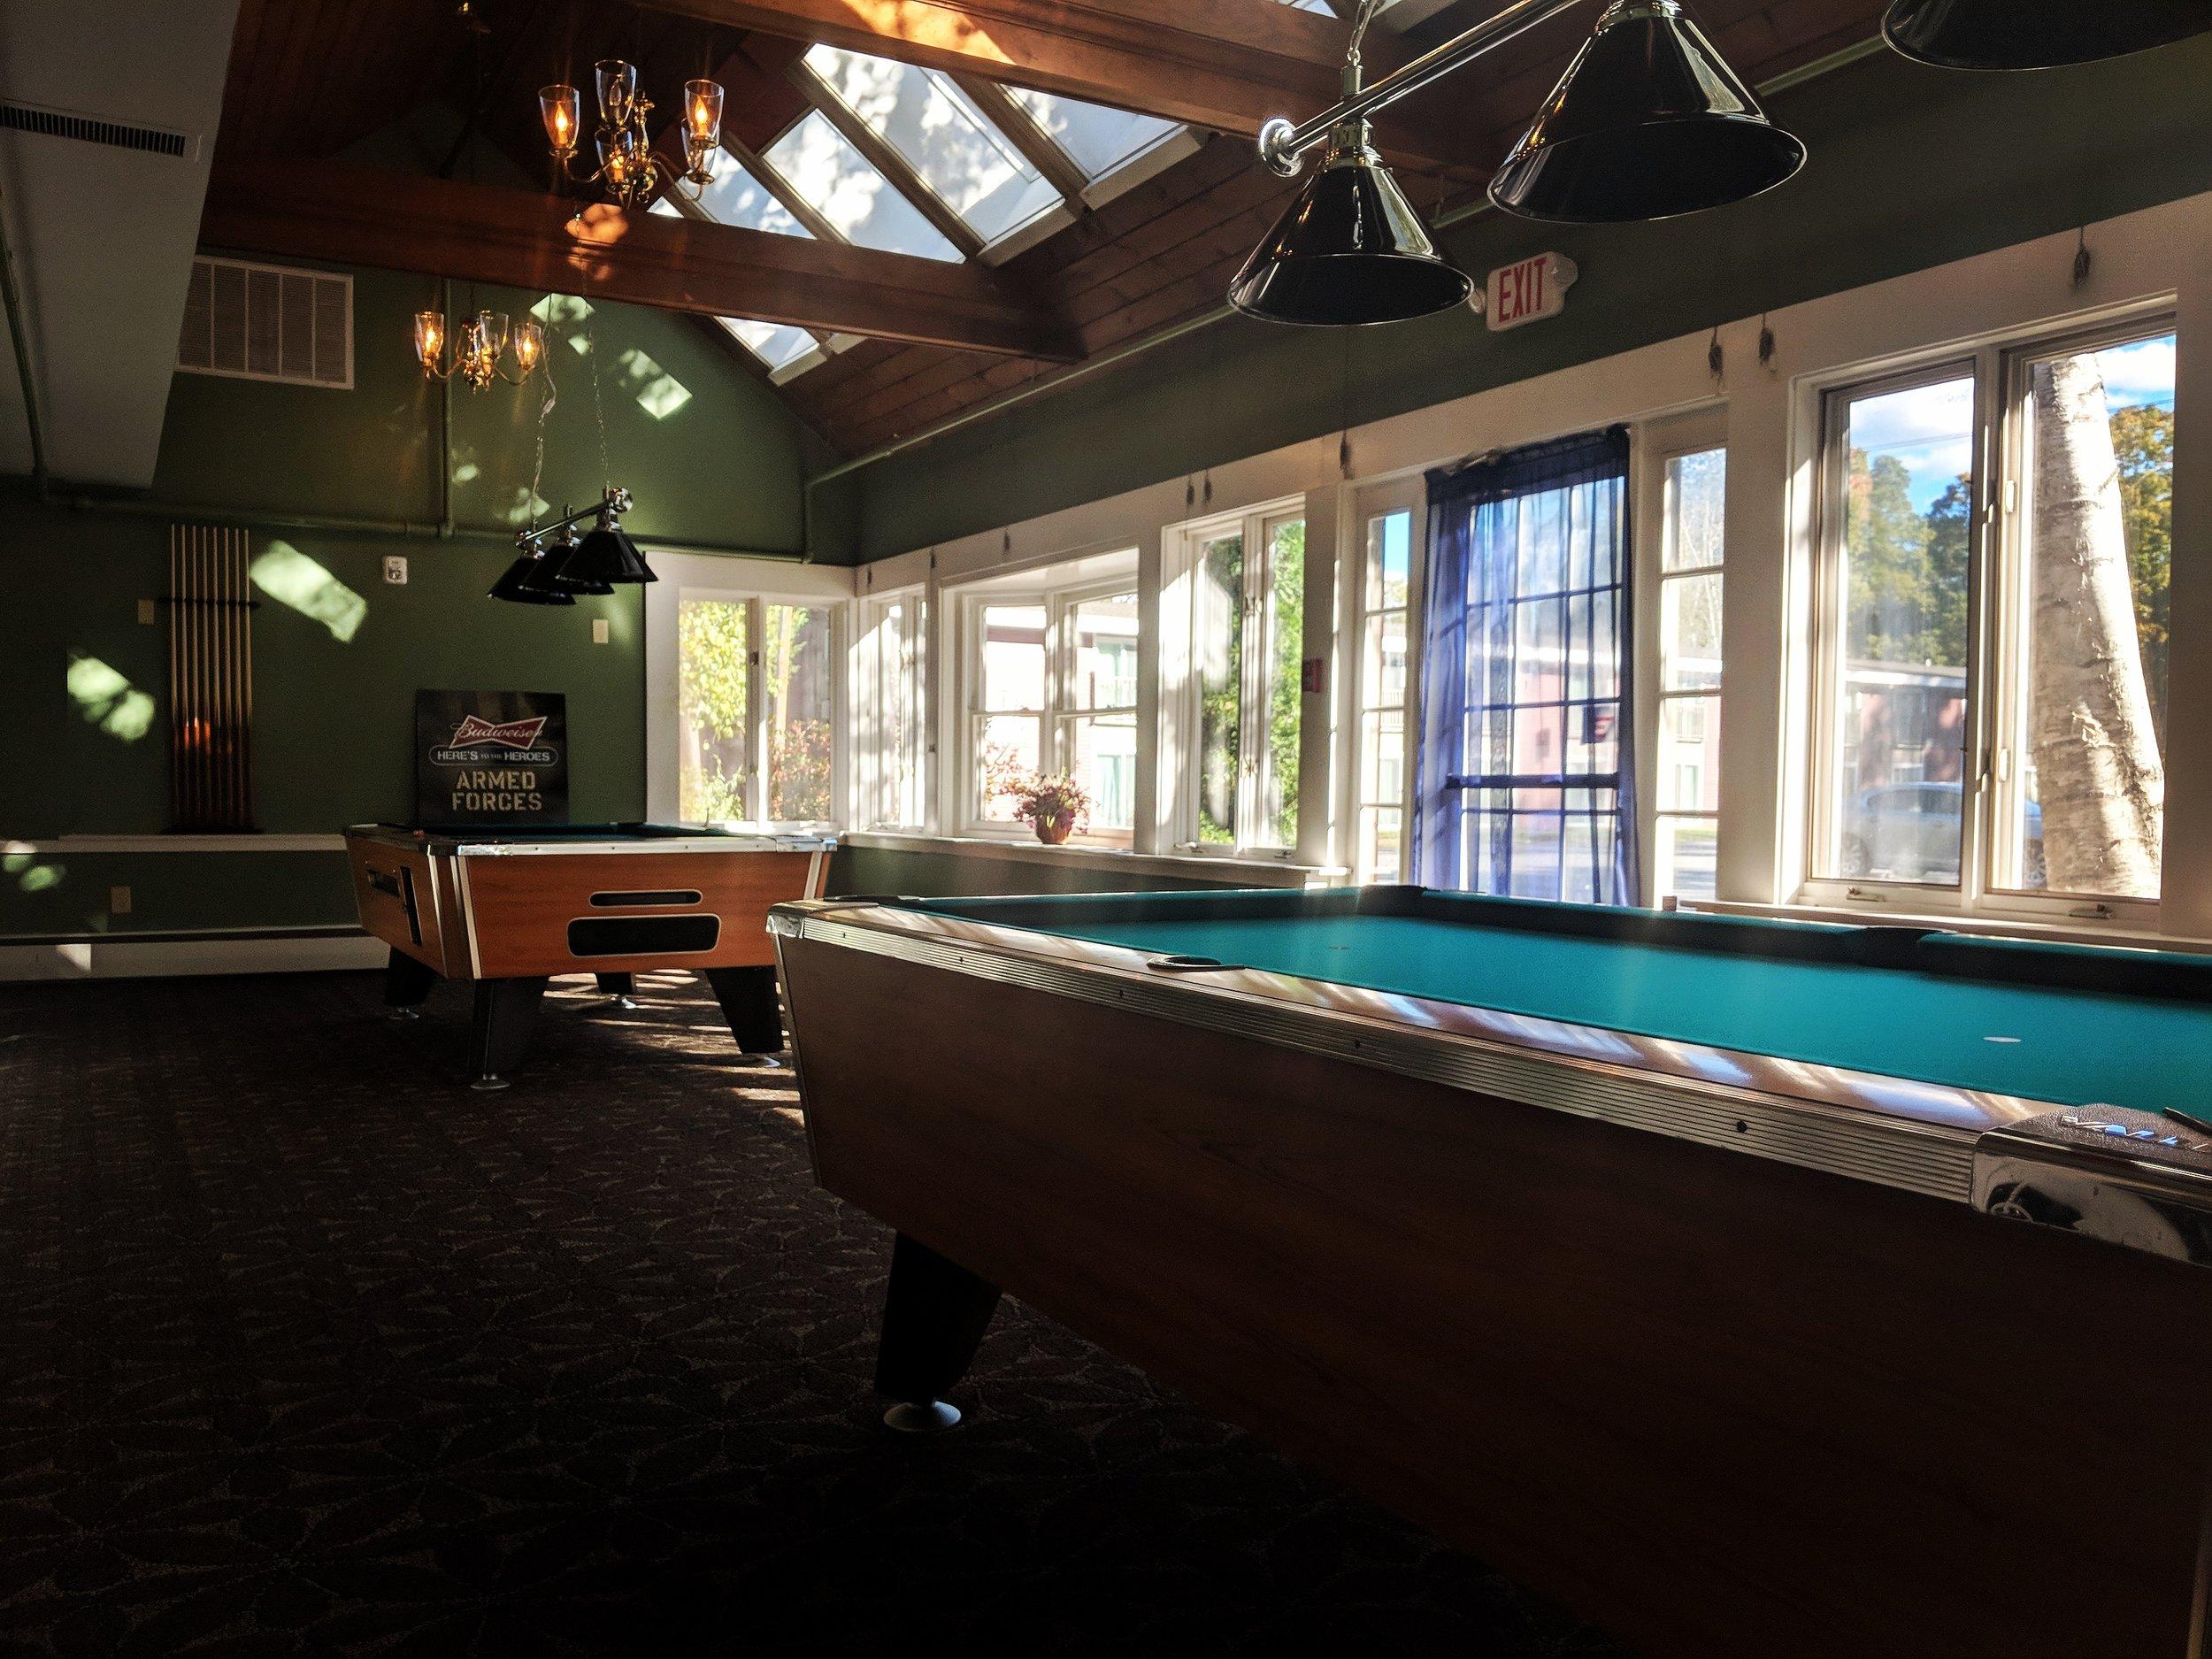 clubvt-billiards-room.jpg